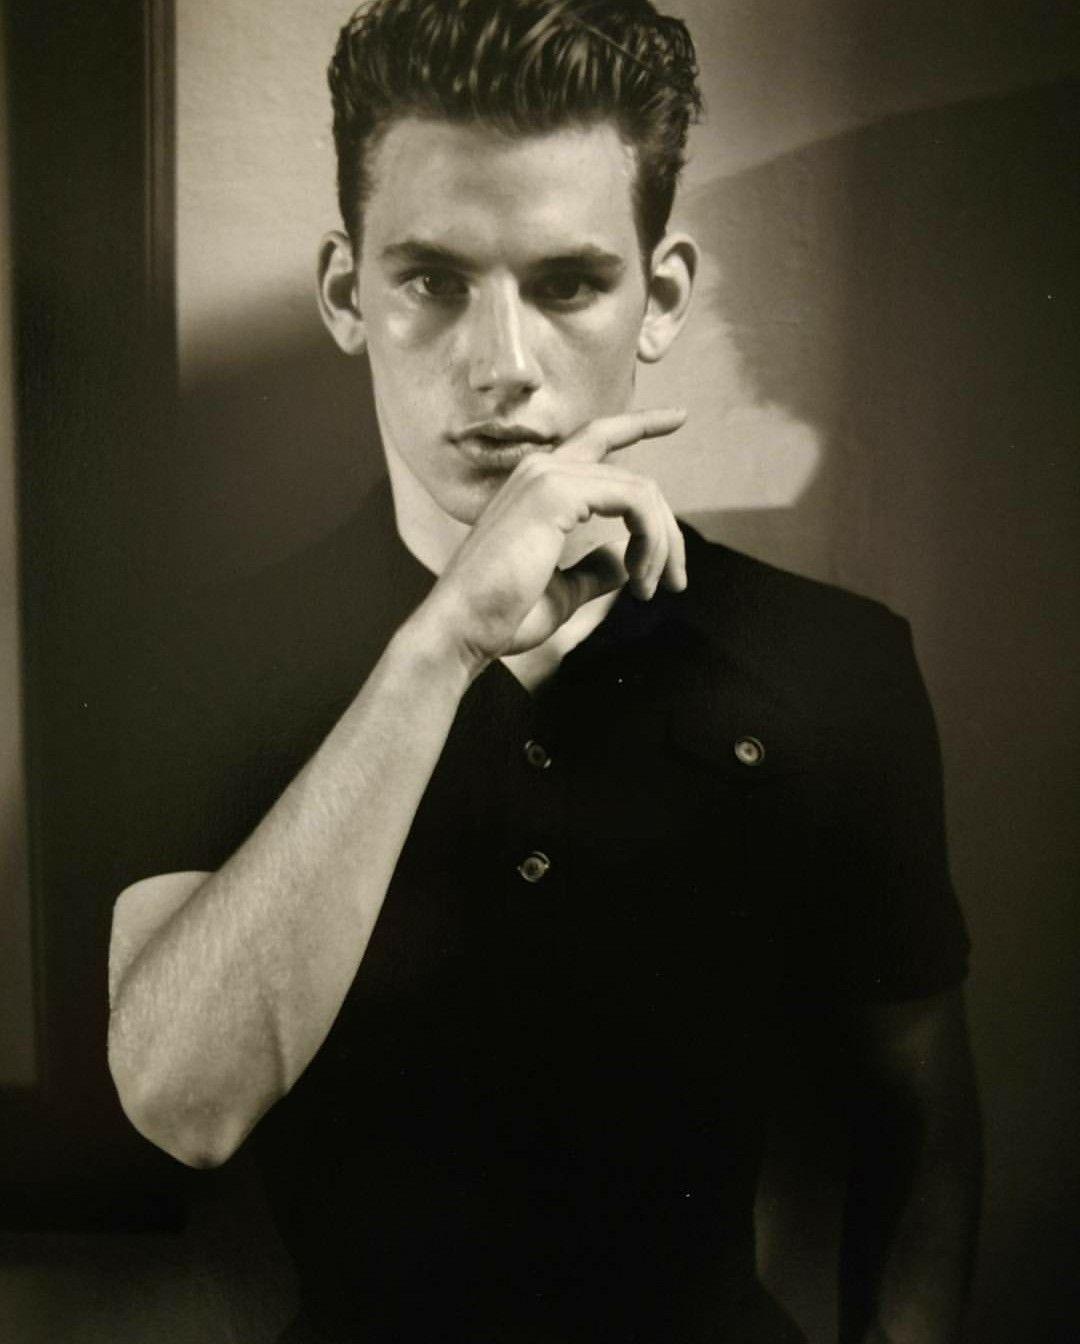 Ryan Haywood Old Modeling Photo From His Modeling Portfolio Rtahlp